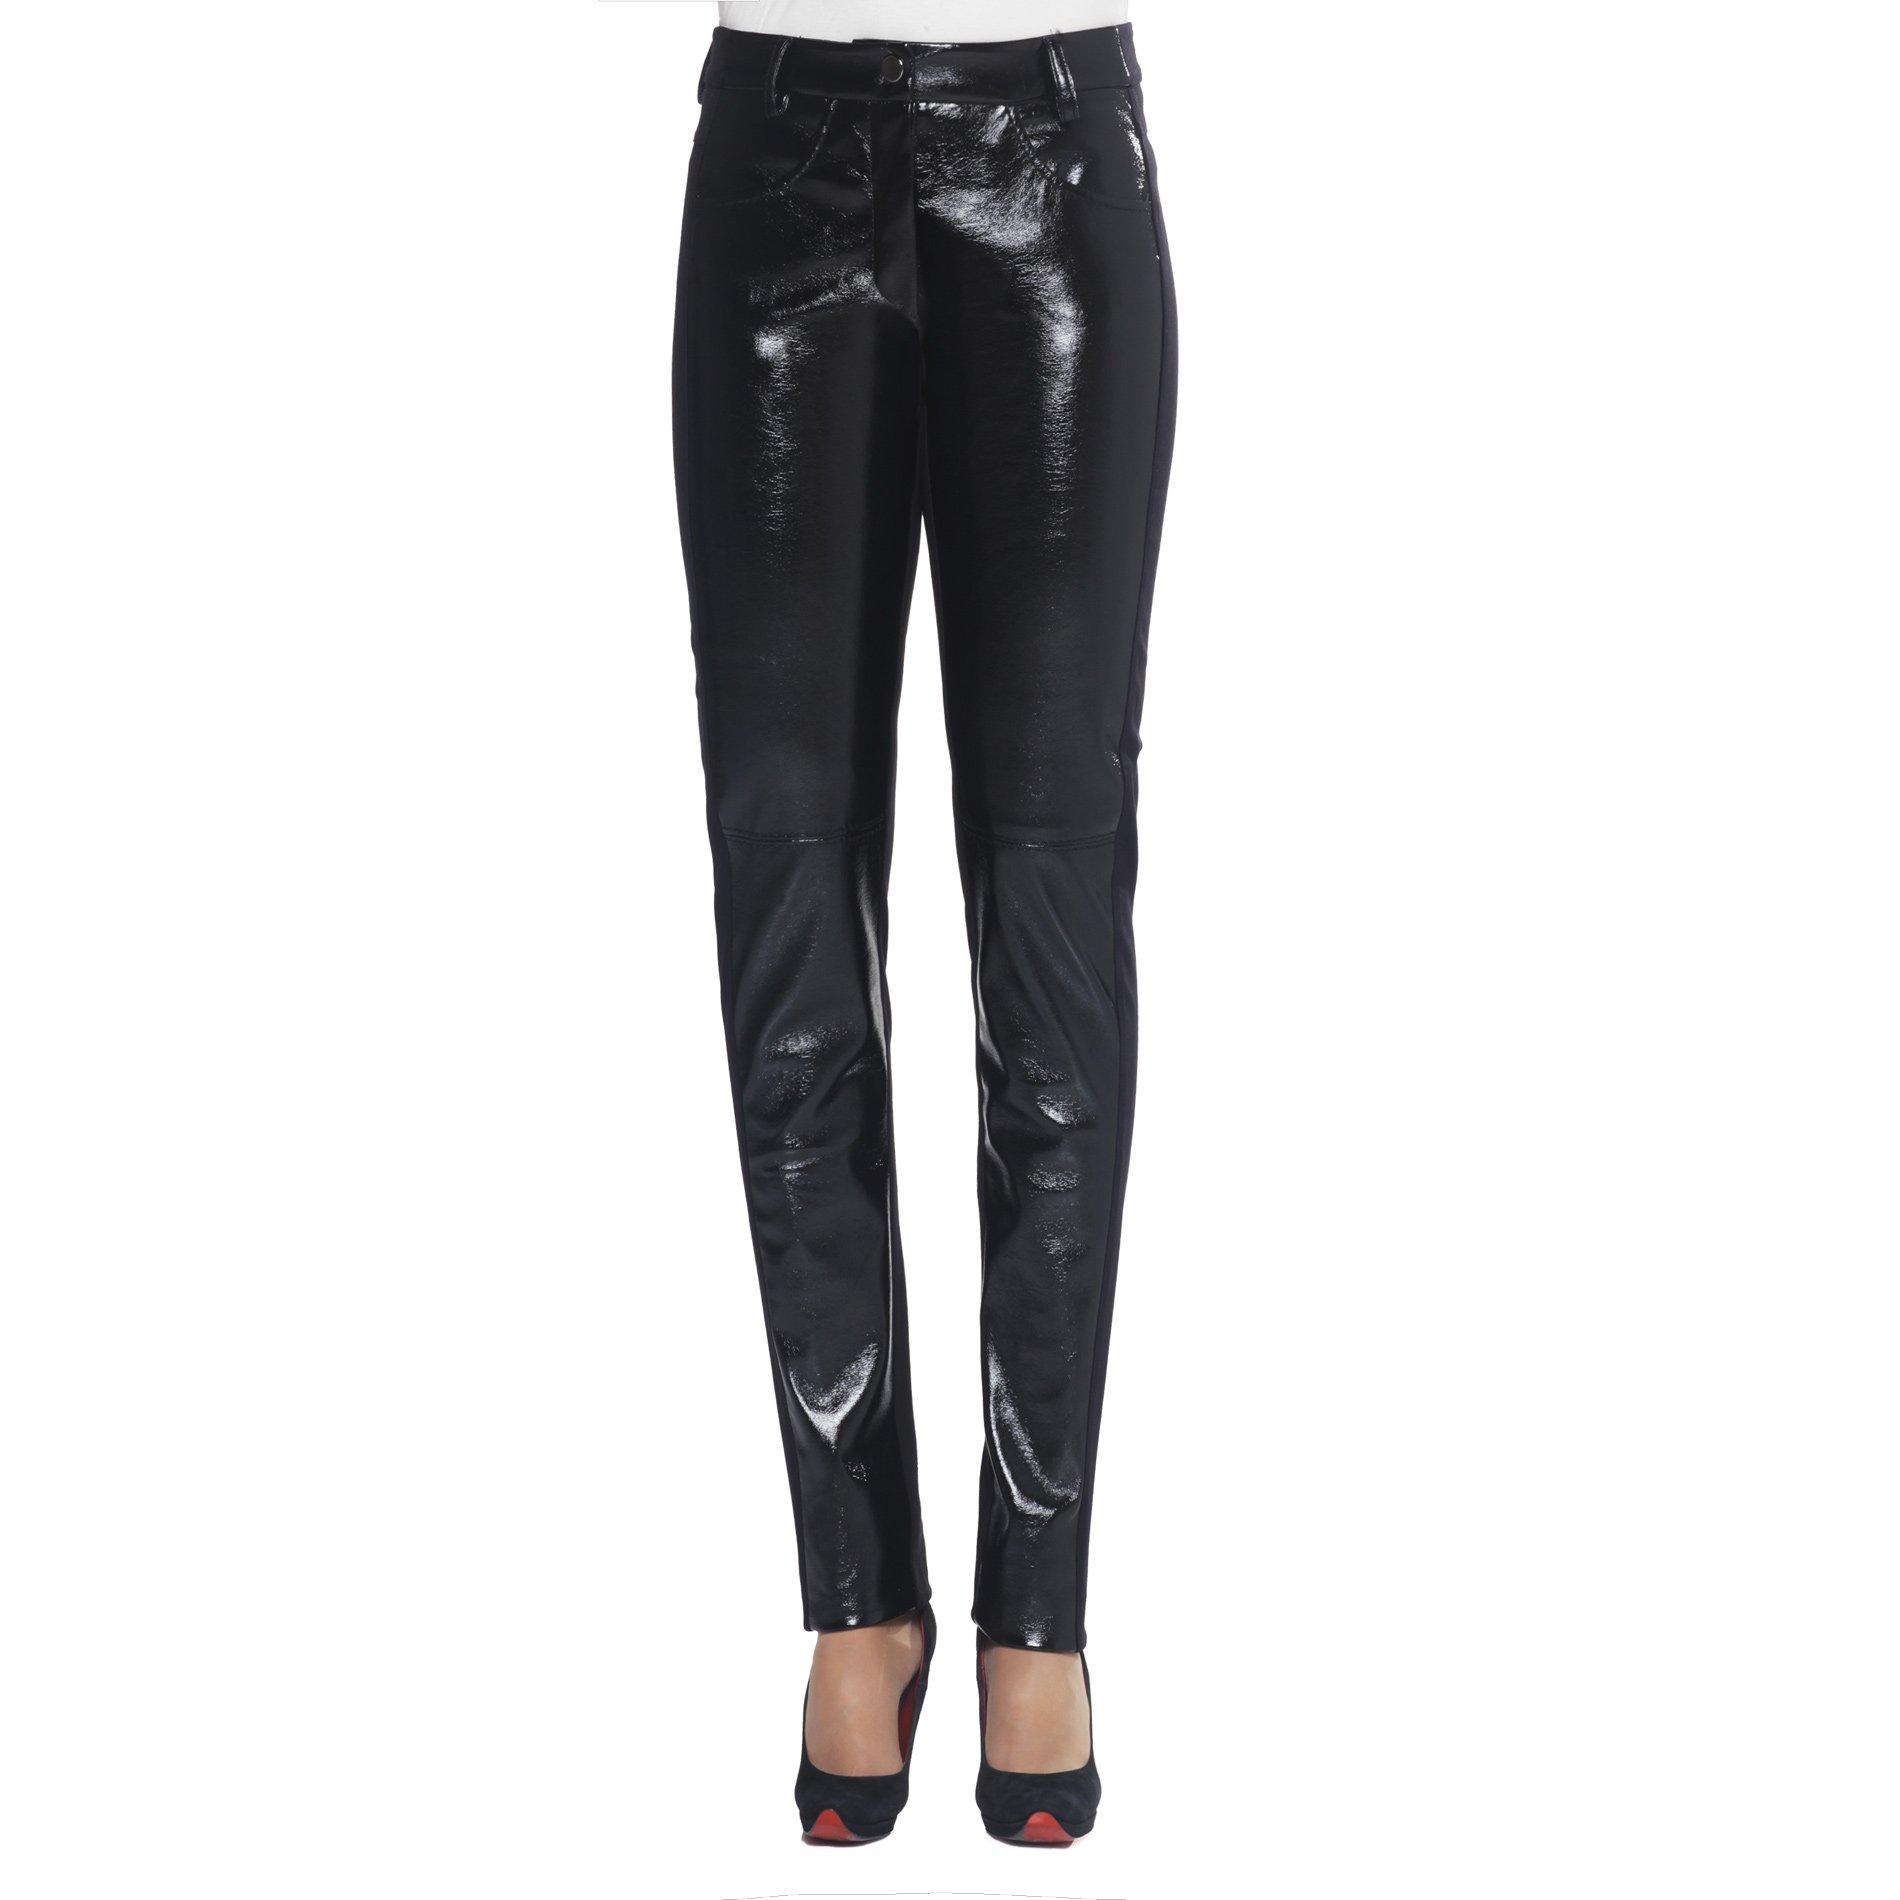 X'S Milano, X'S milano pantaloni donna, pantaloni neri, pantaloni vernice neri con tasche